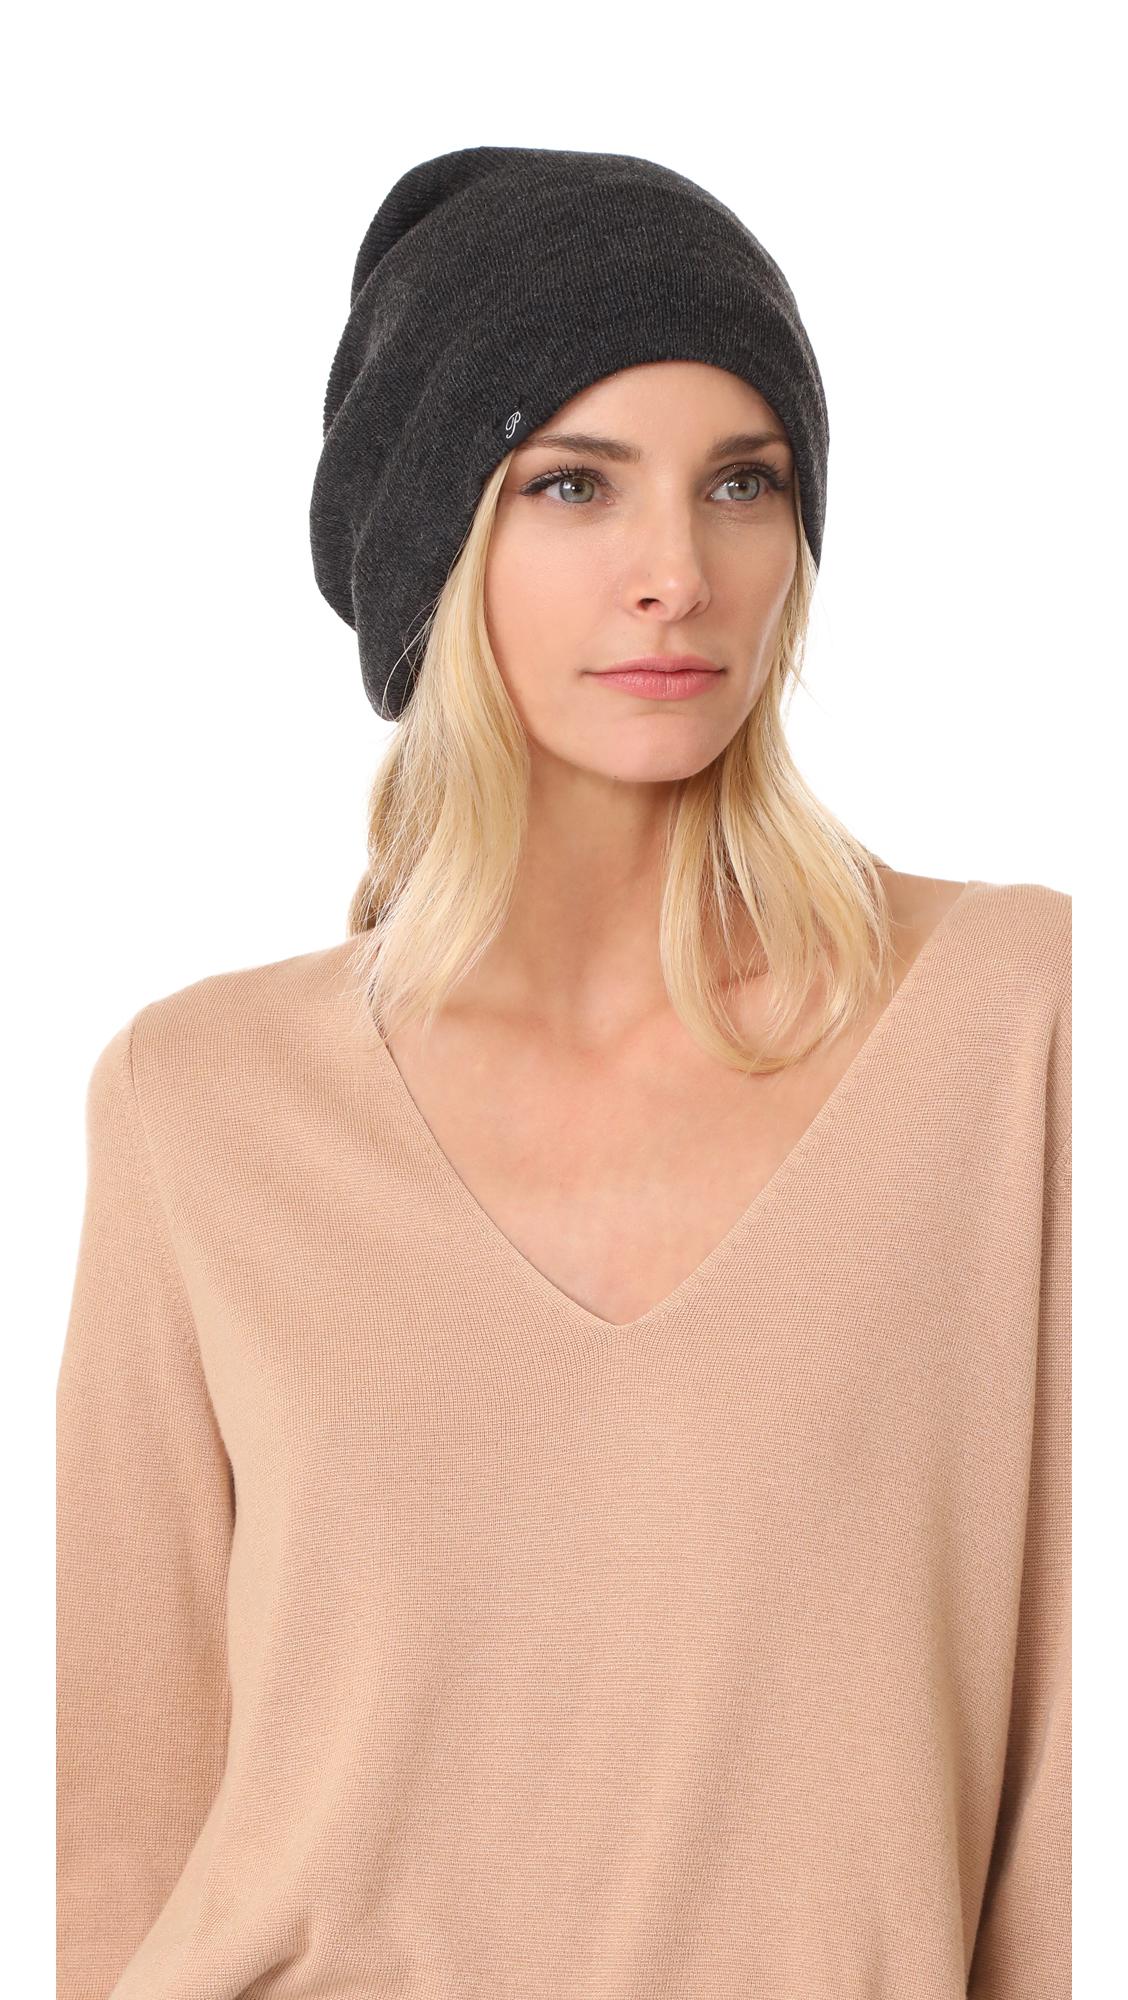 Plush Barca Slouchy Fleece Lined Hat - Charcoal